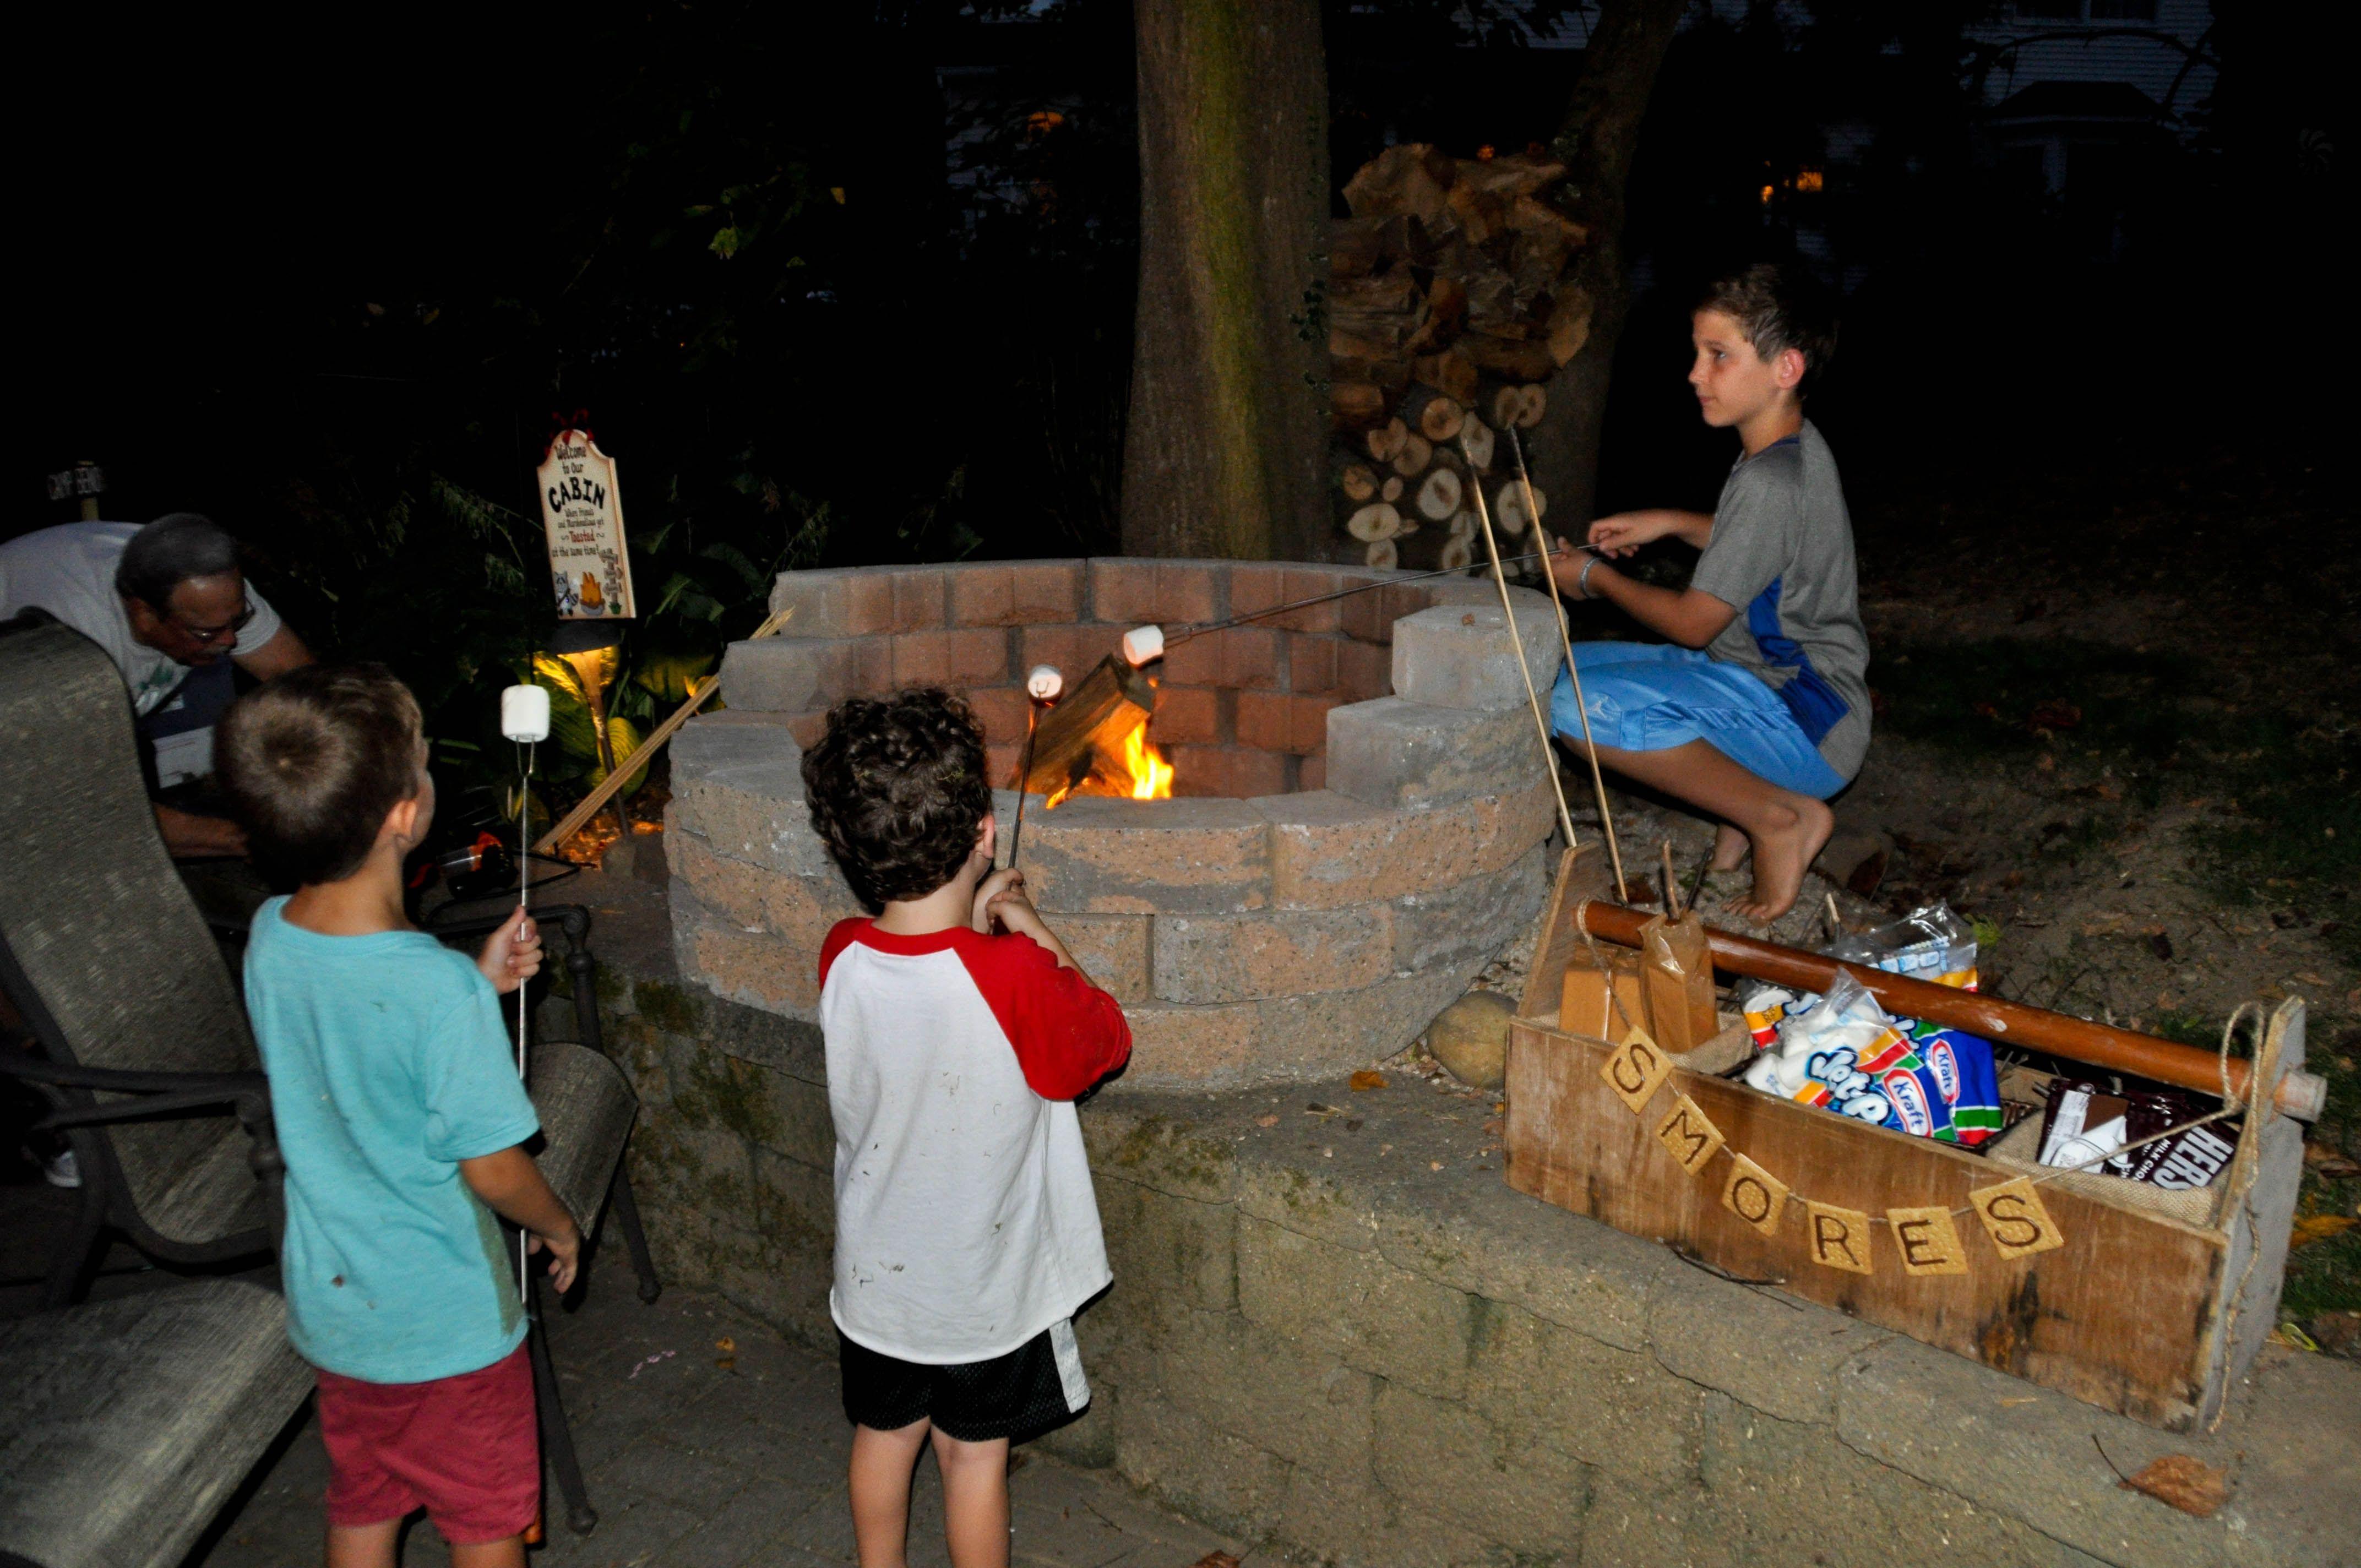 Backyard Camping Party Activity Campfire Smores Game